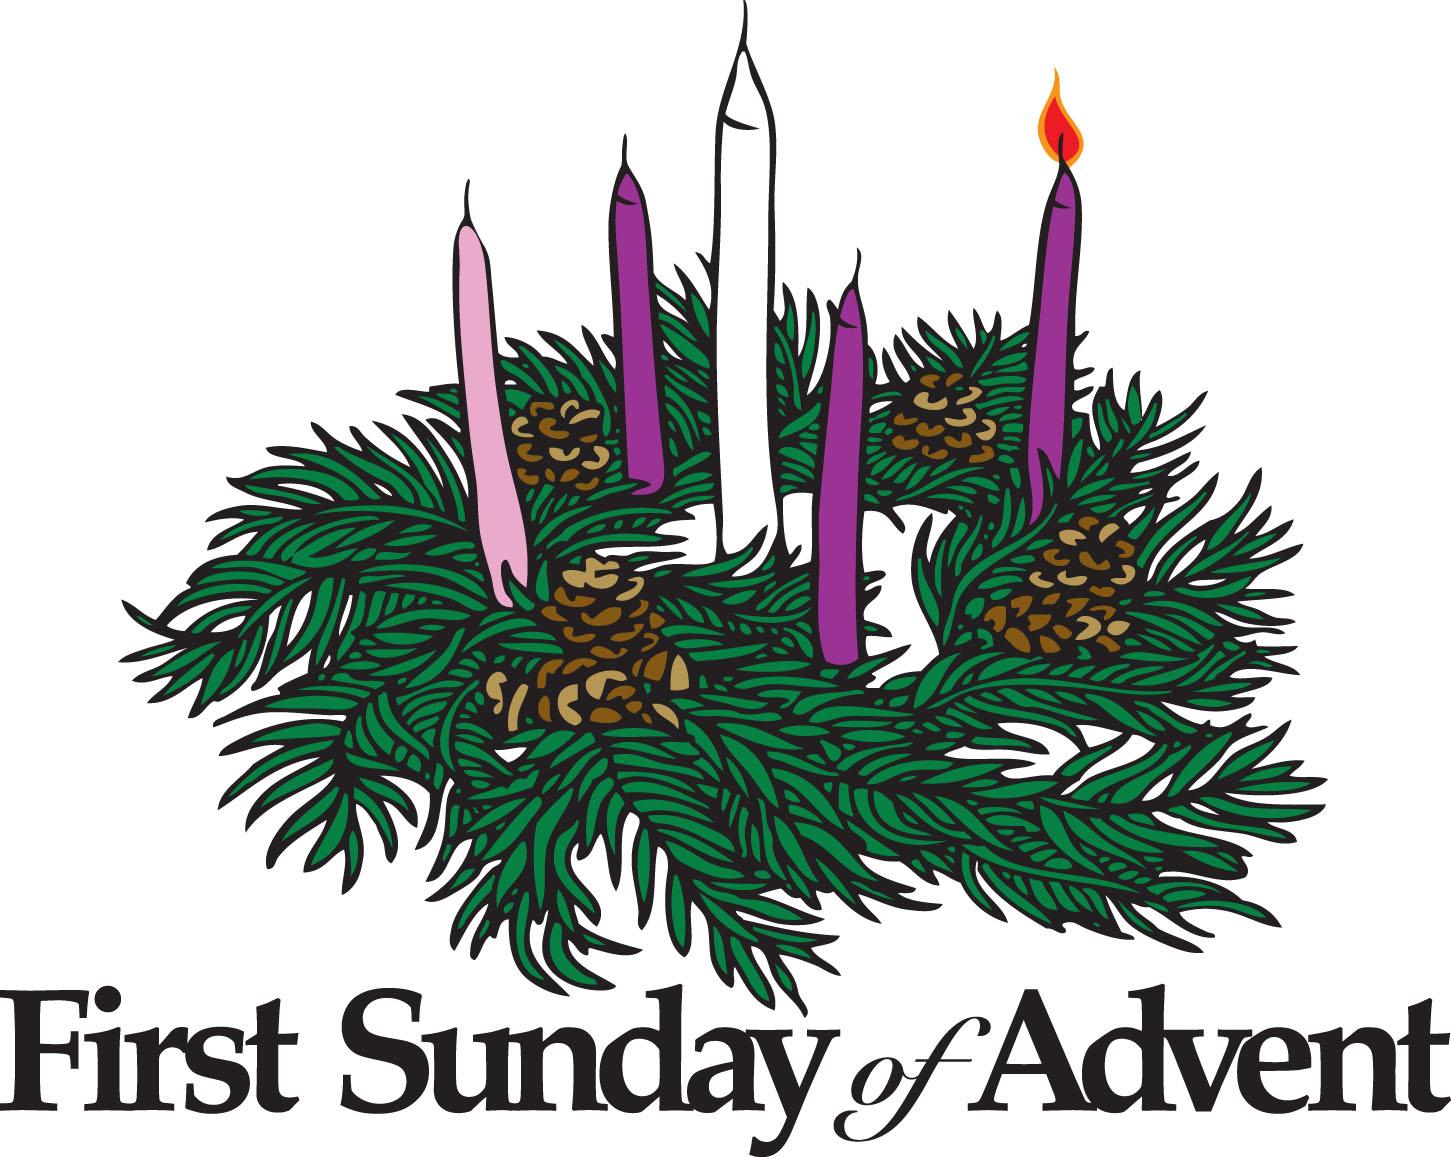 Advent clipart service. Free download clip art